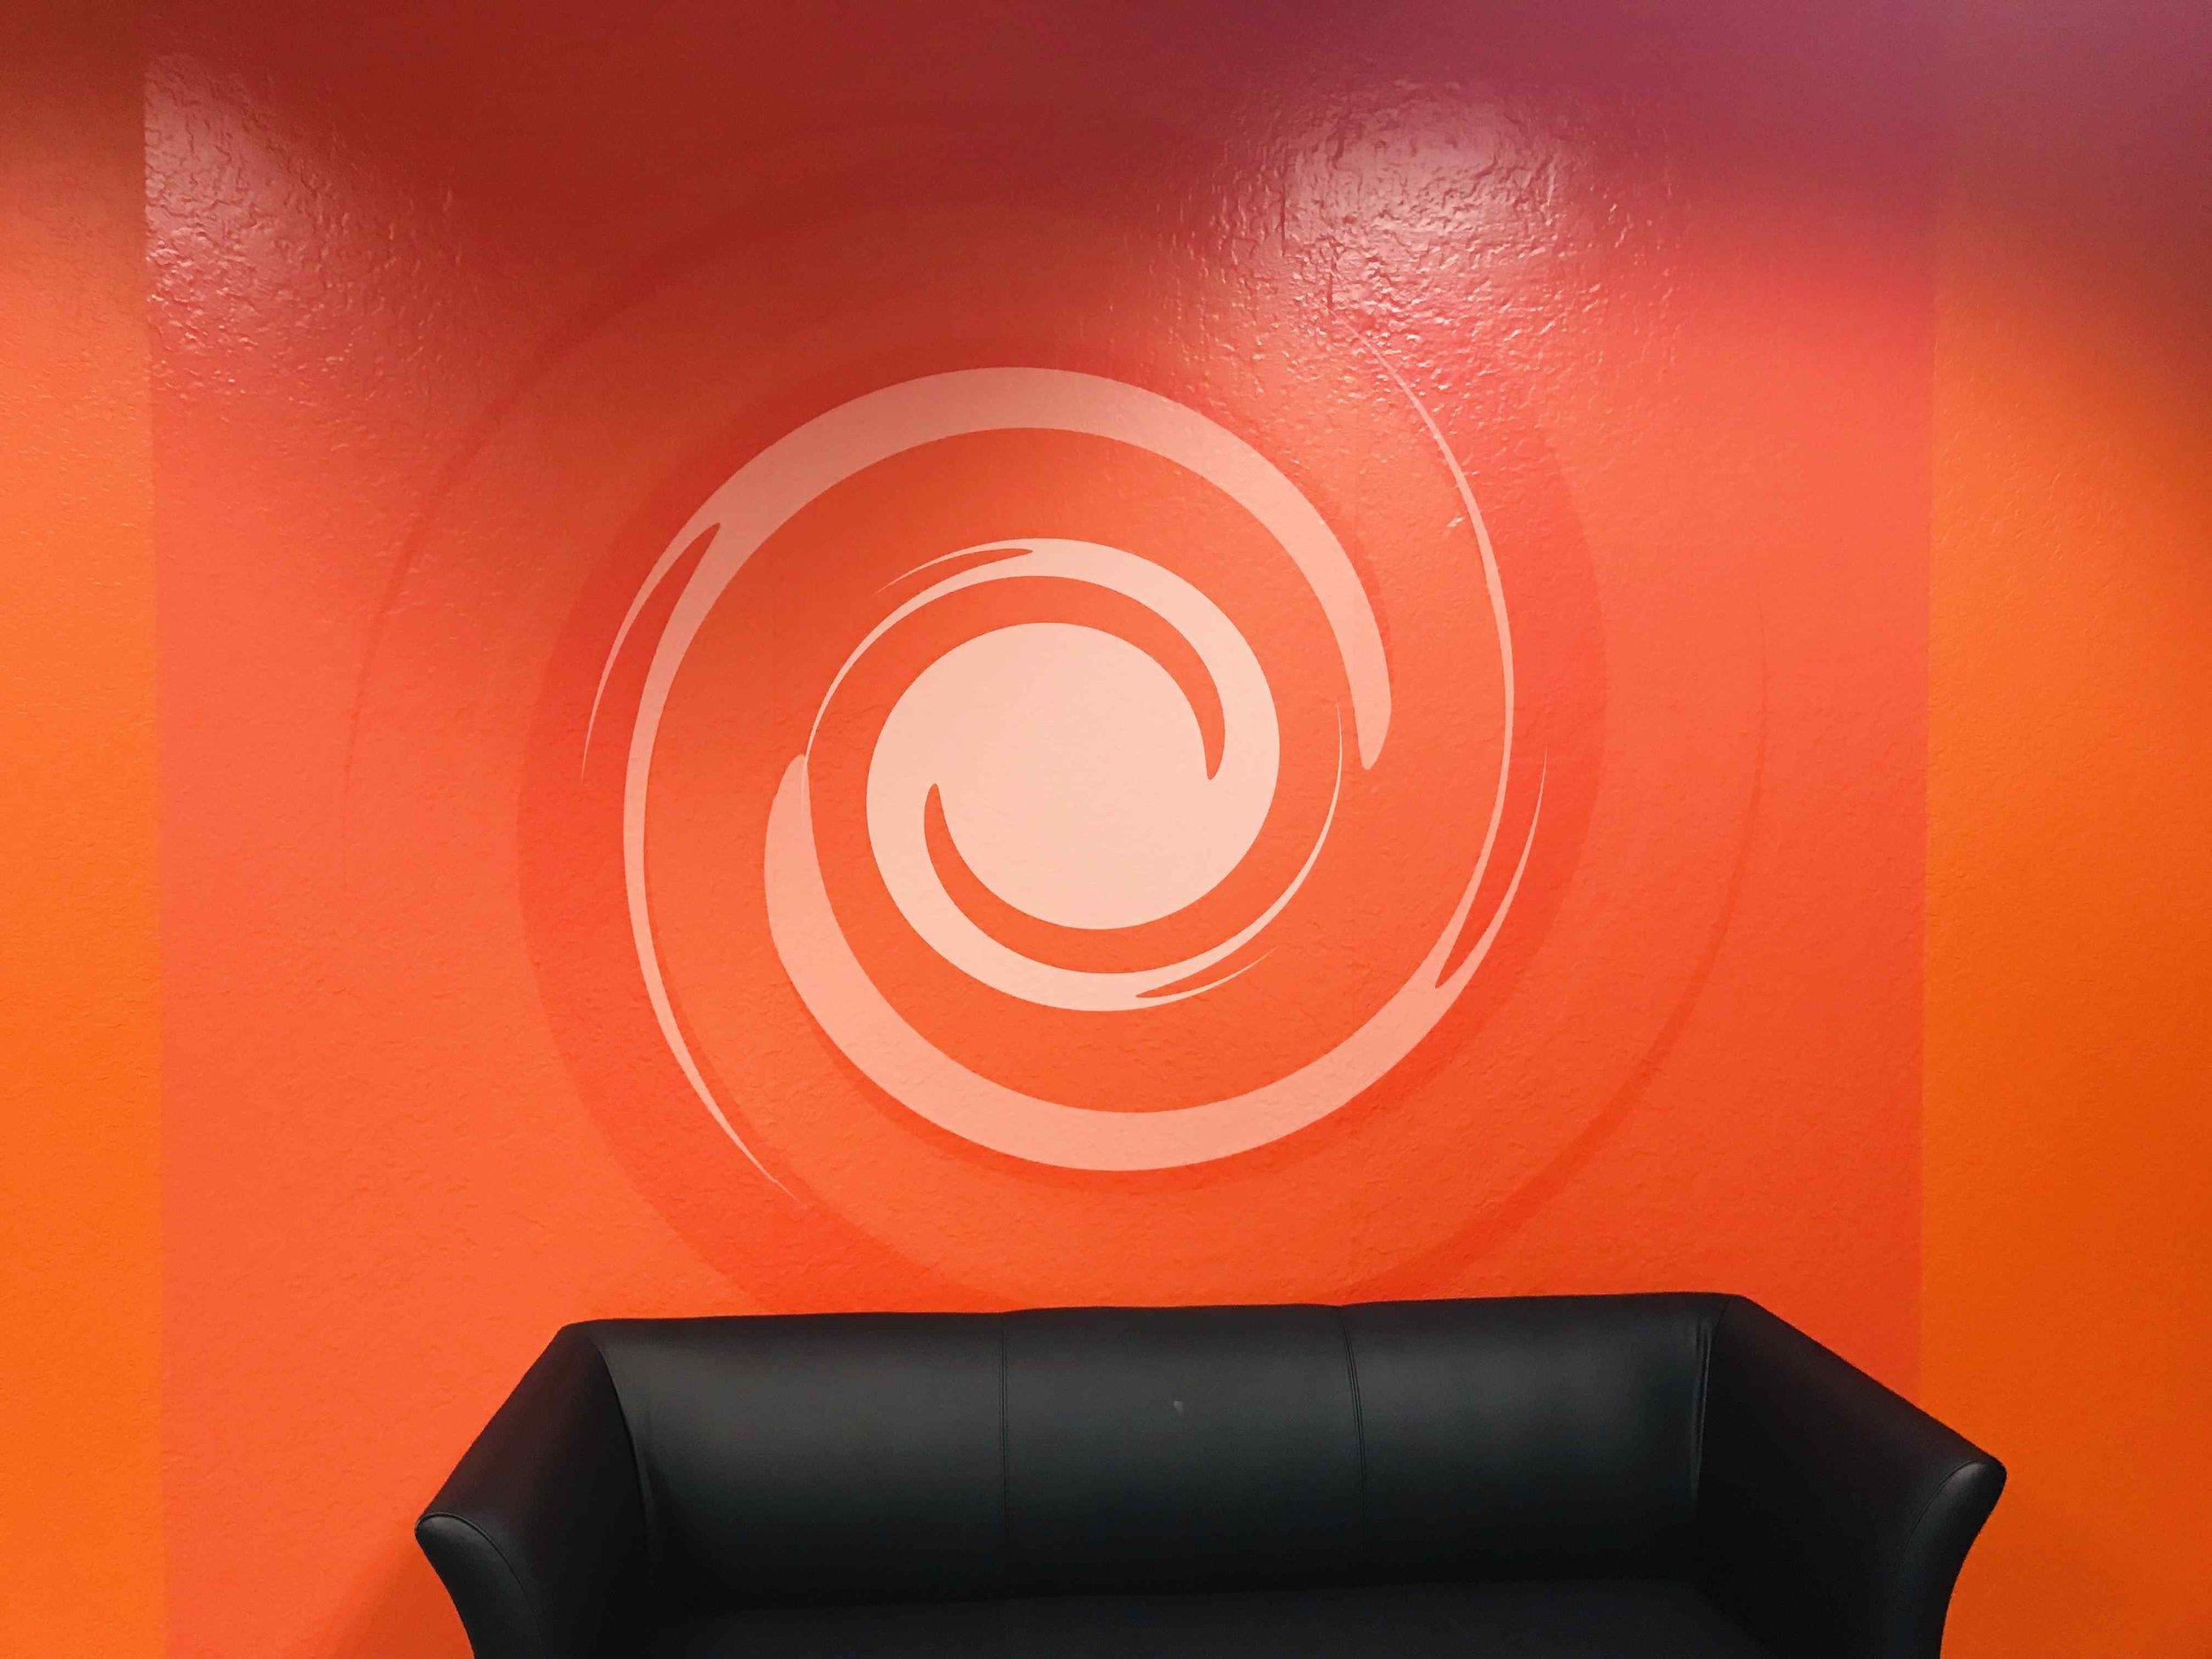 Vinyl-Wall-Mural.jpg